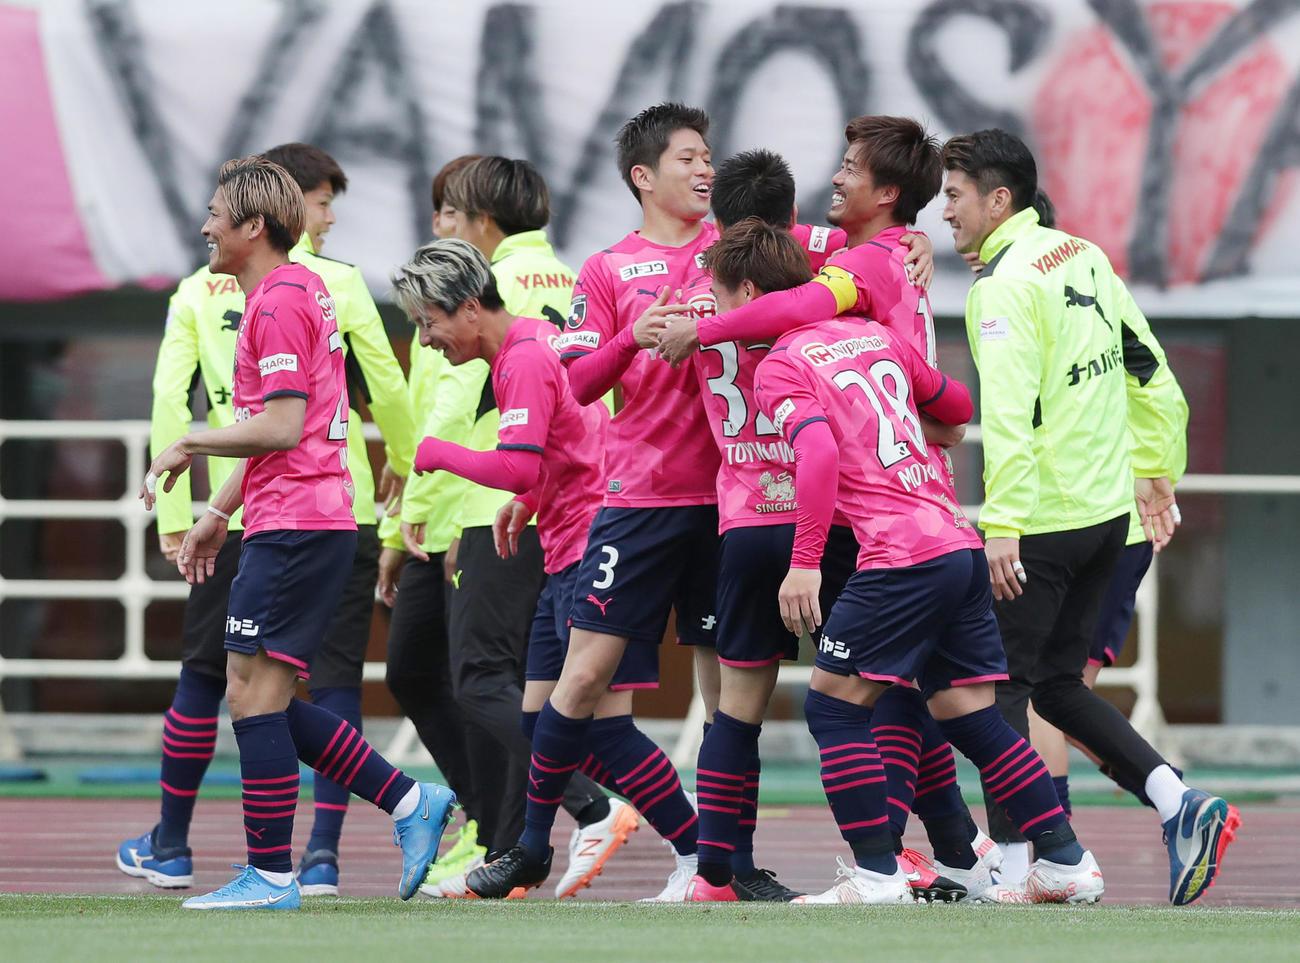 C大阪対浦和 後半、先制ゴールを決めたC大阪丸橋(右から2人目)はイレブンから祝福され笑顔を見せる(撮影・前田充)